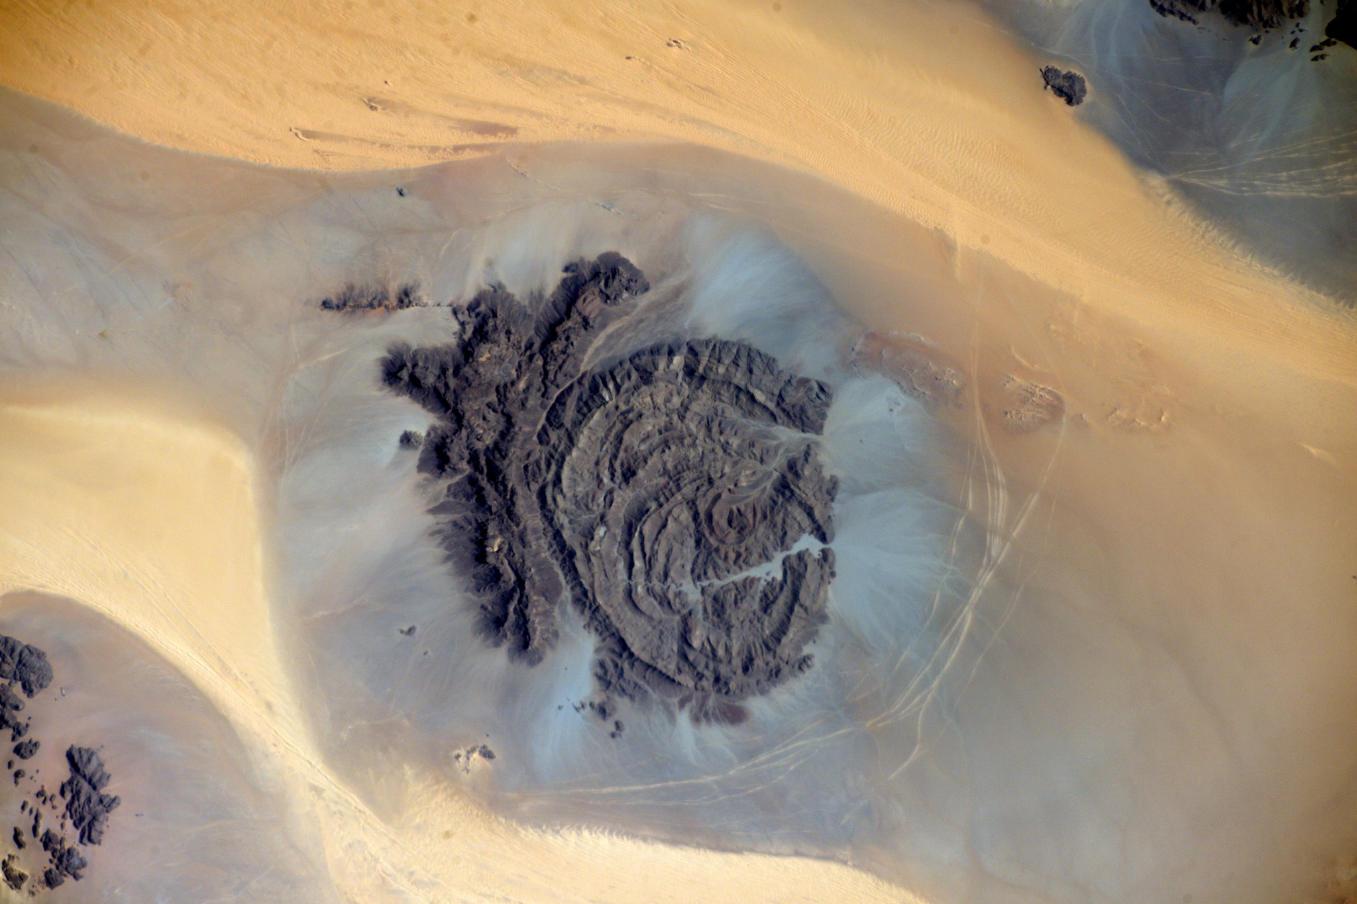 La Terre dans l'oeil de Thomas Pesquet #25: le Jebel Arkanu